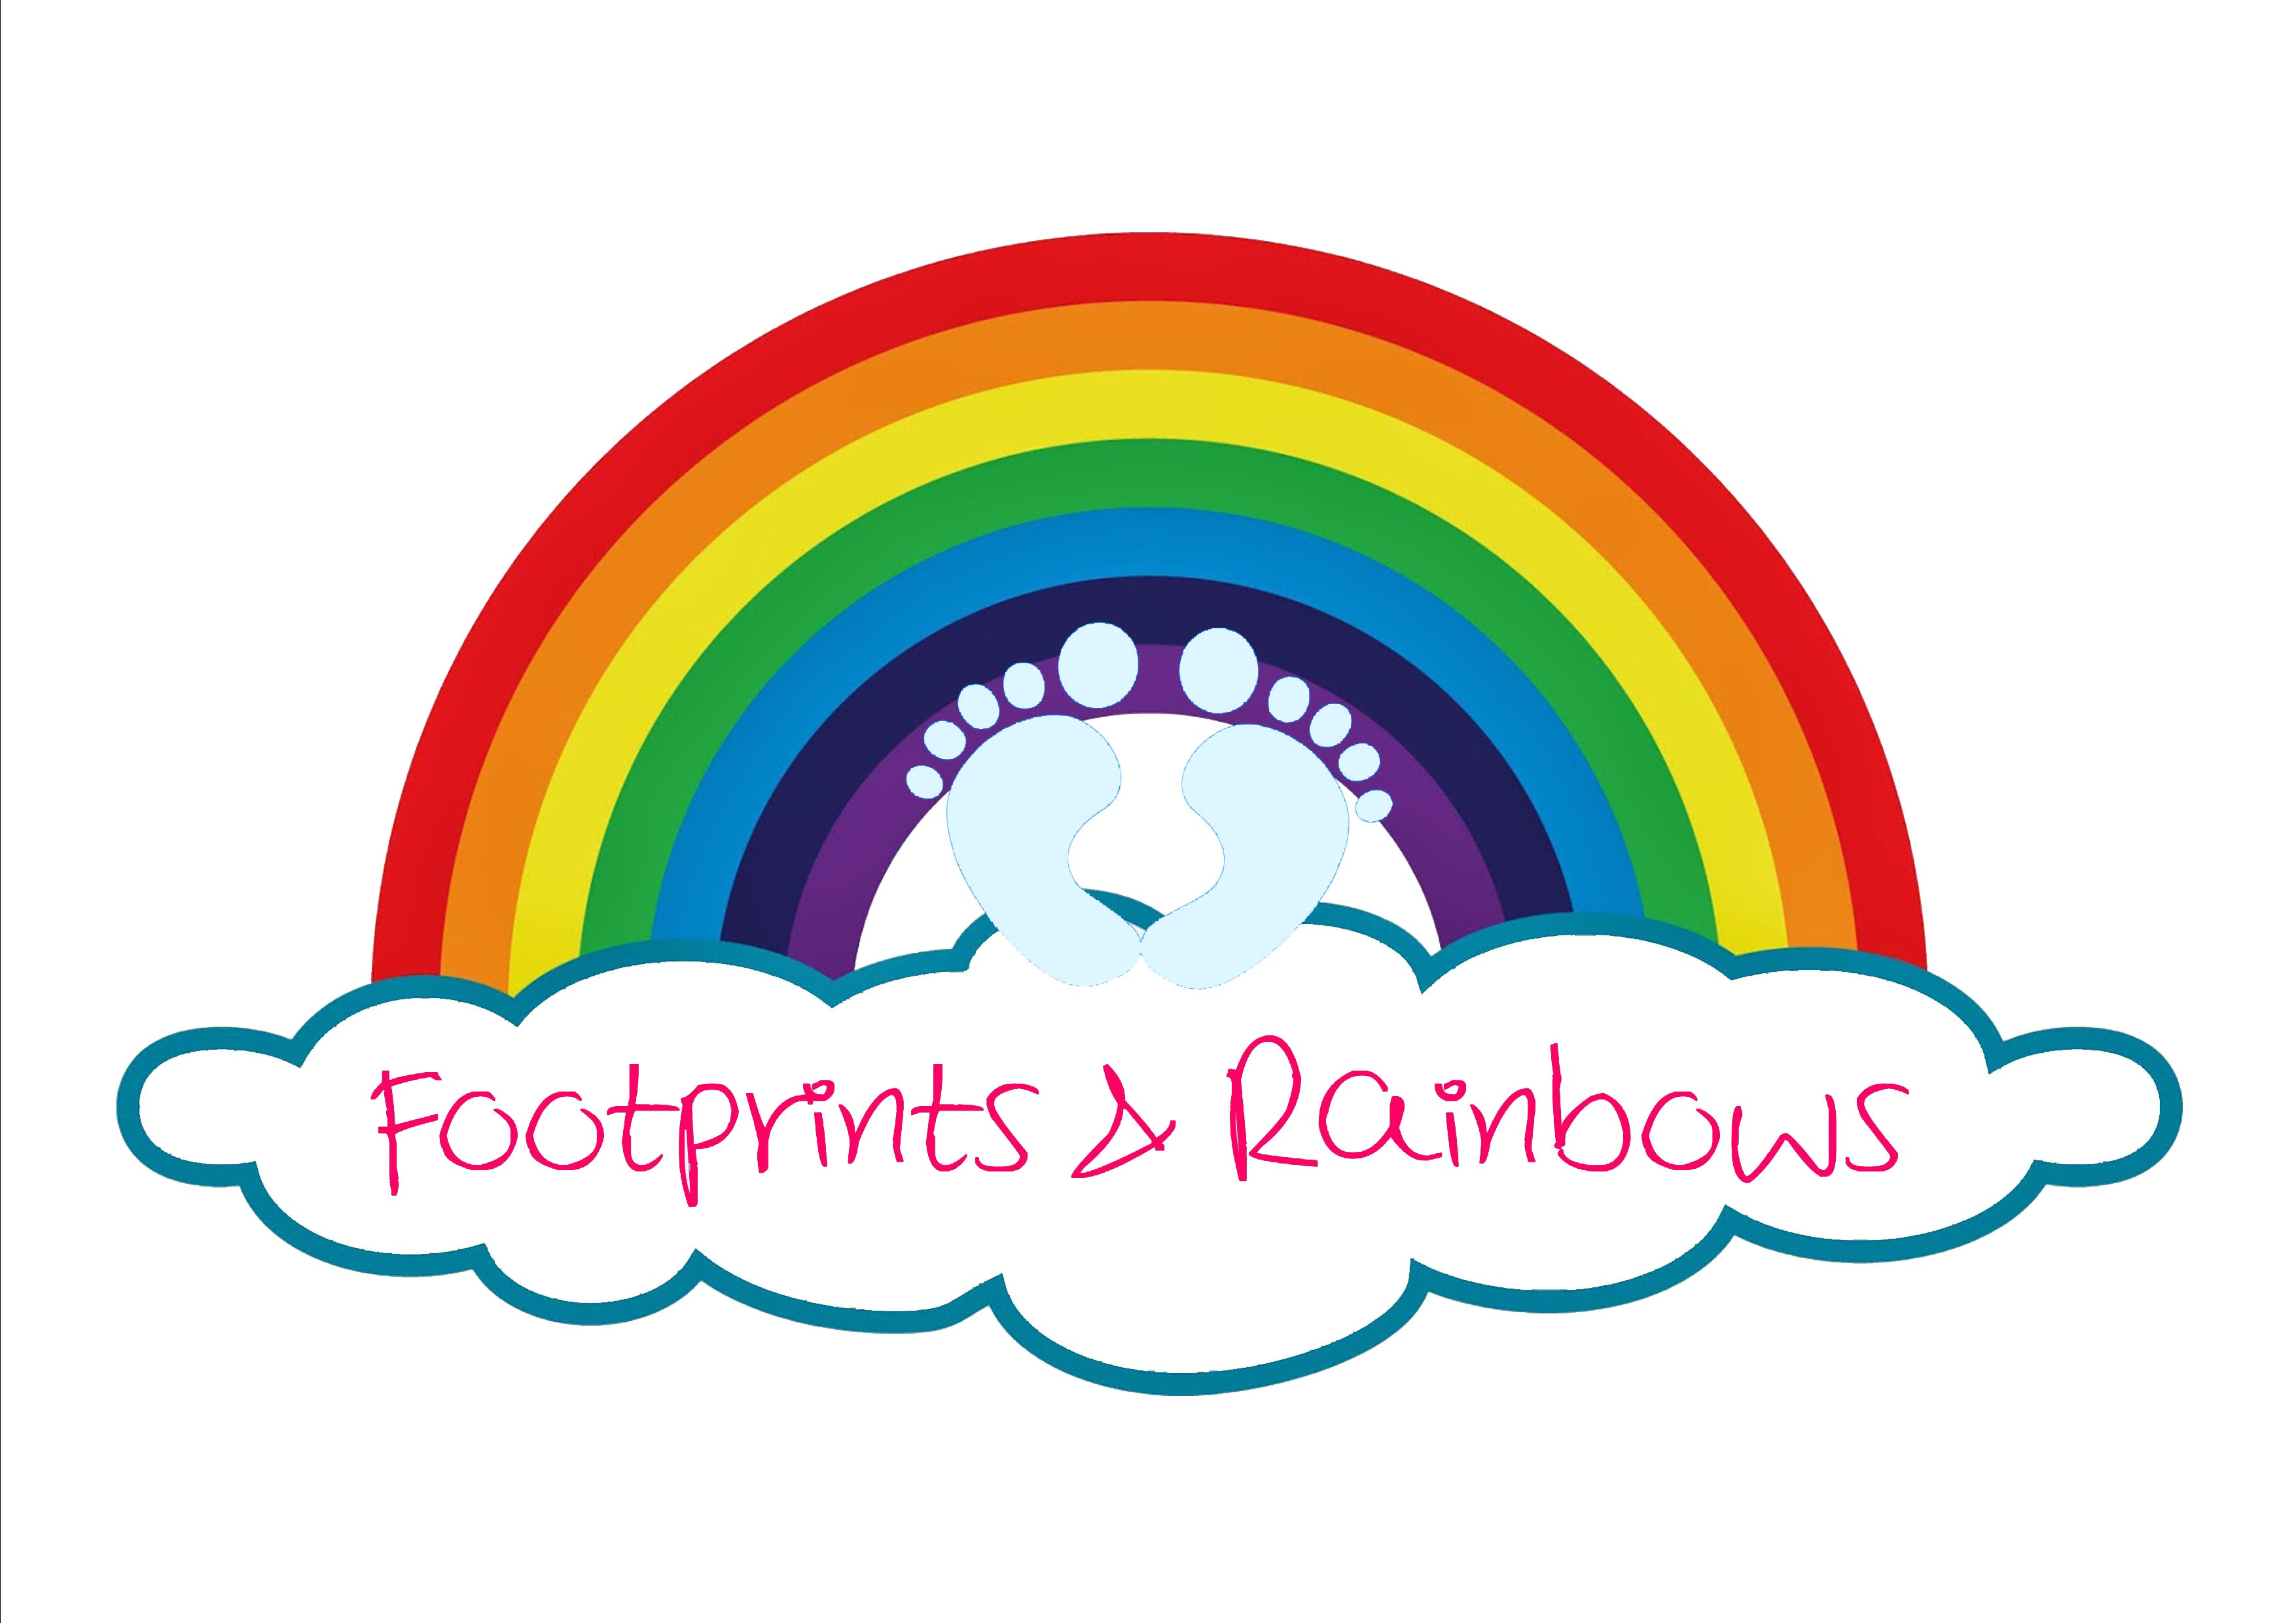 FOOTPRINTS & RAINBOWS